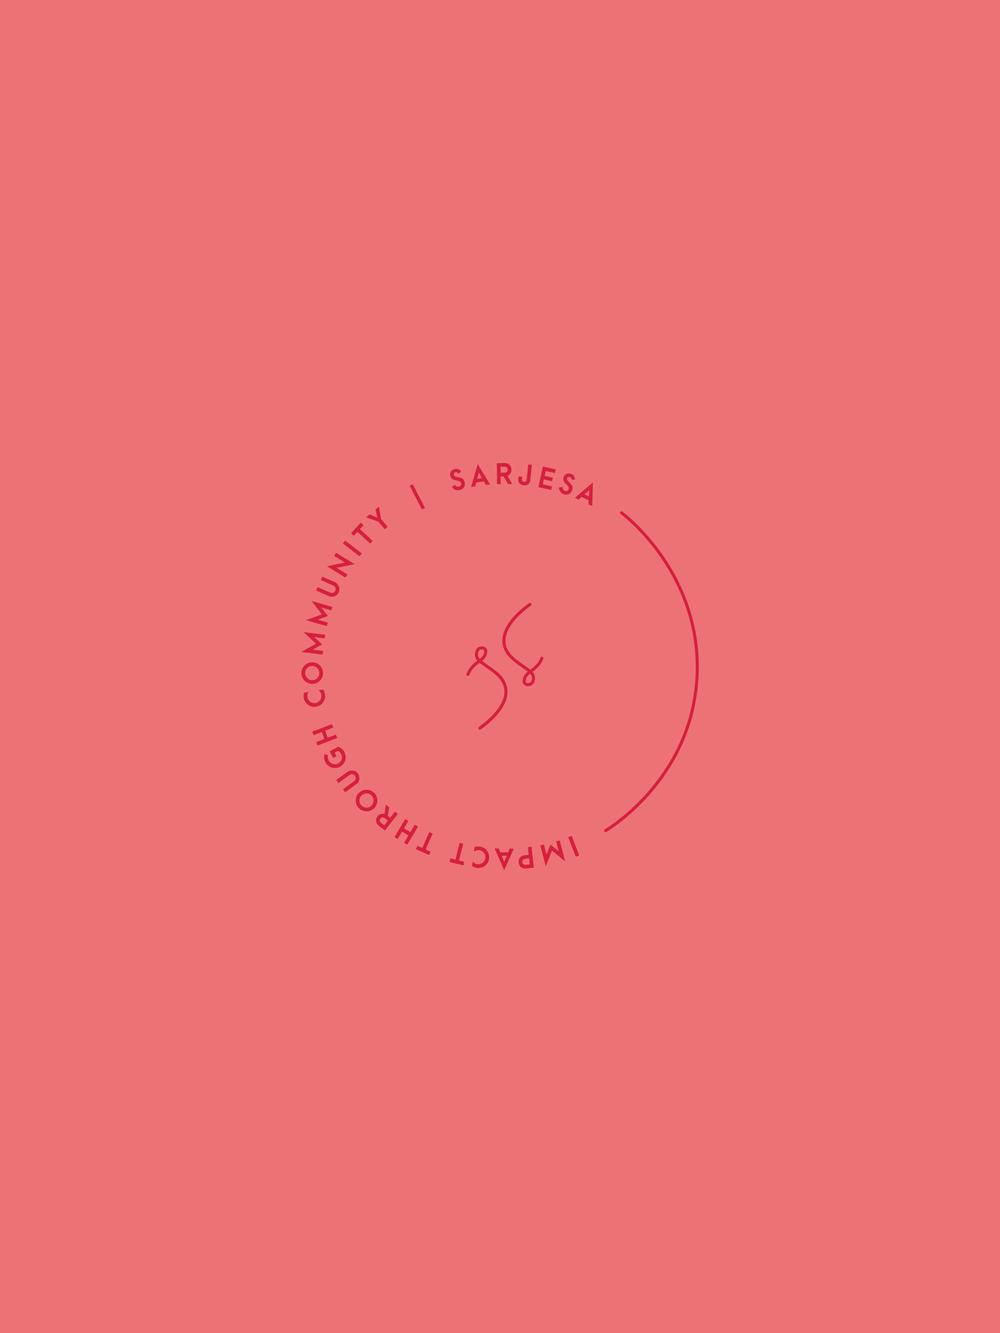 Sarjesa Logo + Identity Design | Trout + Taylor www.troutandtaylor.com